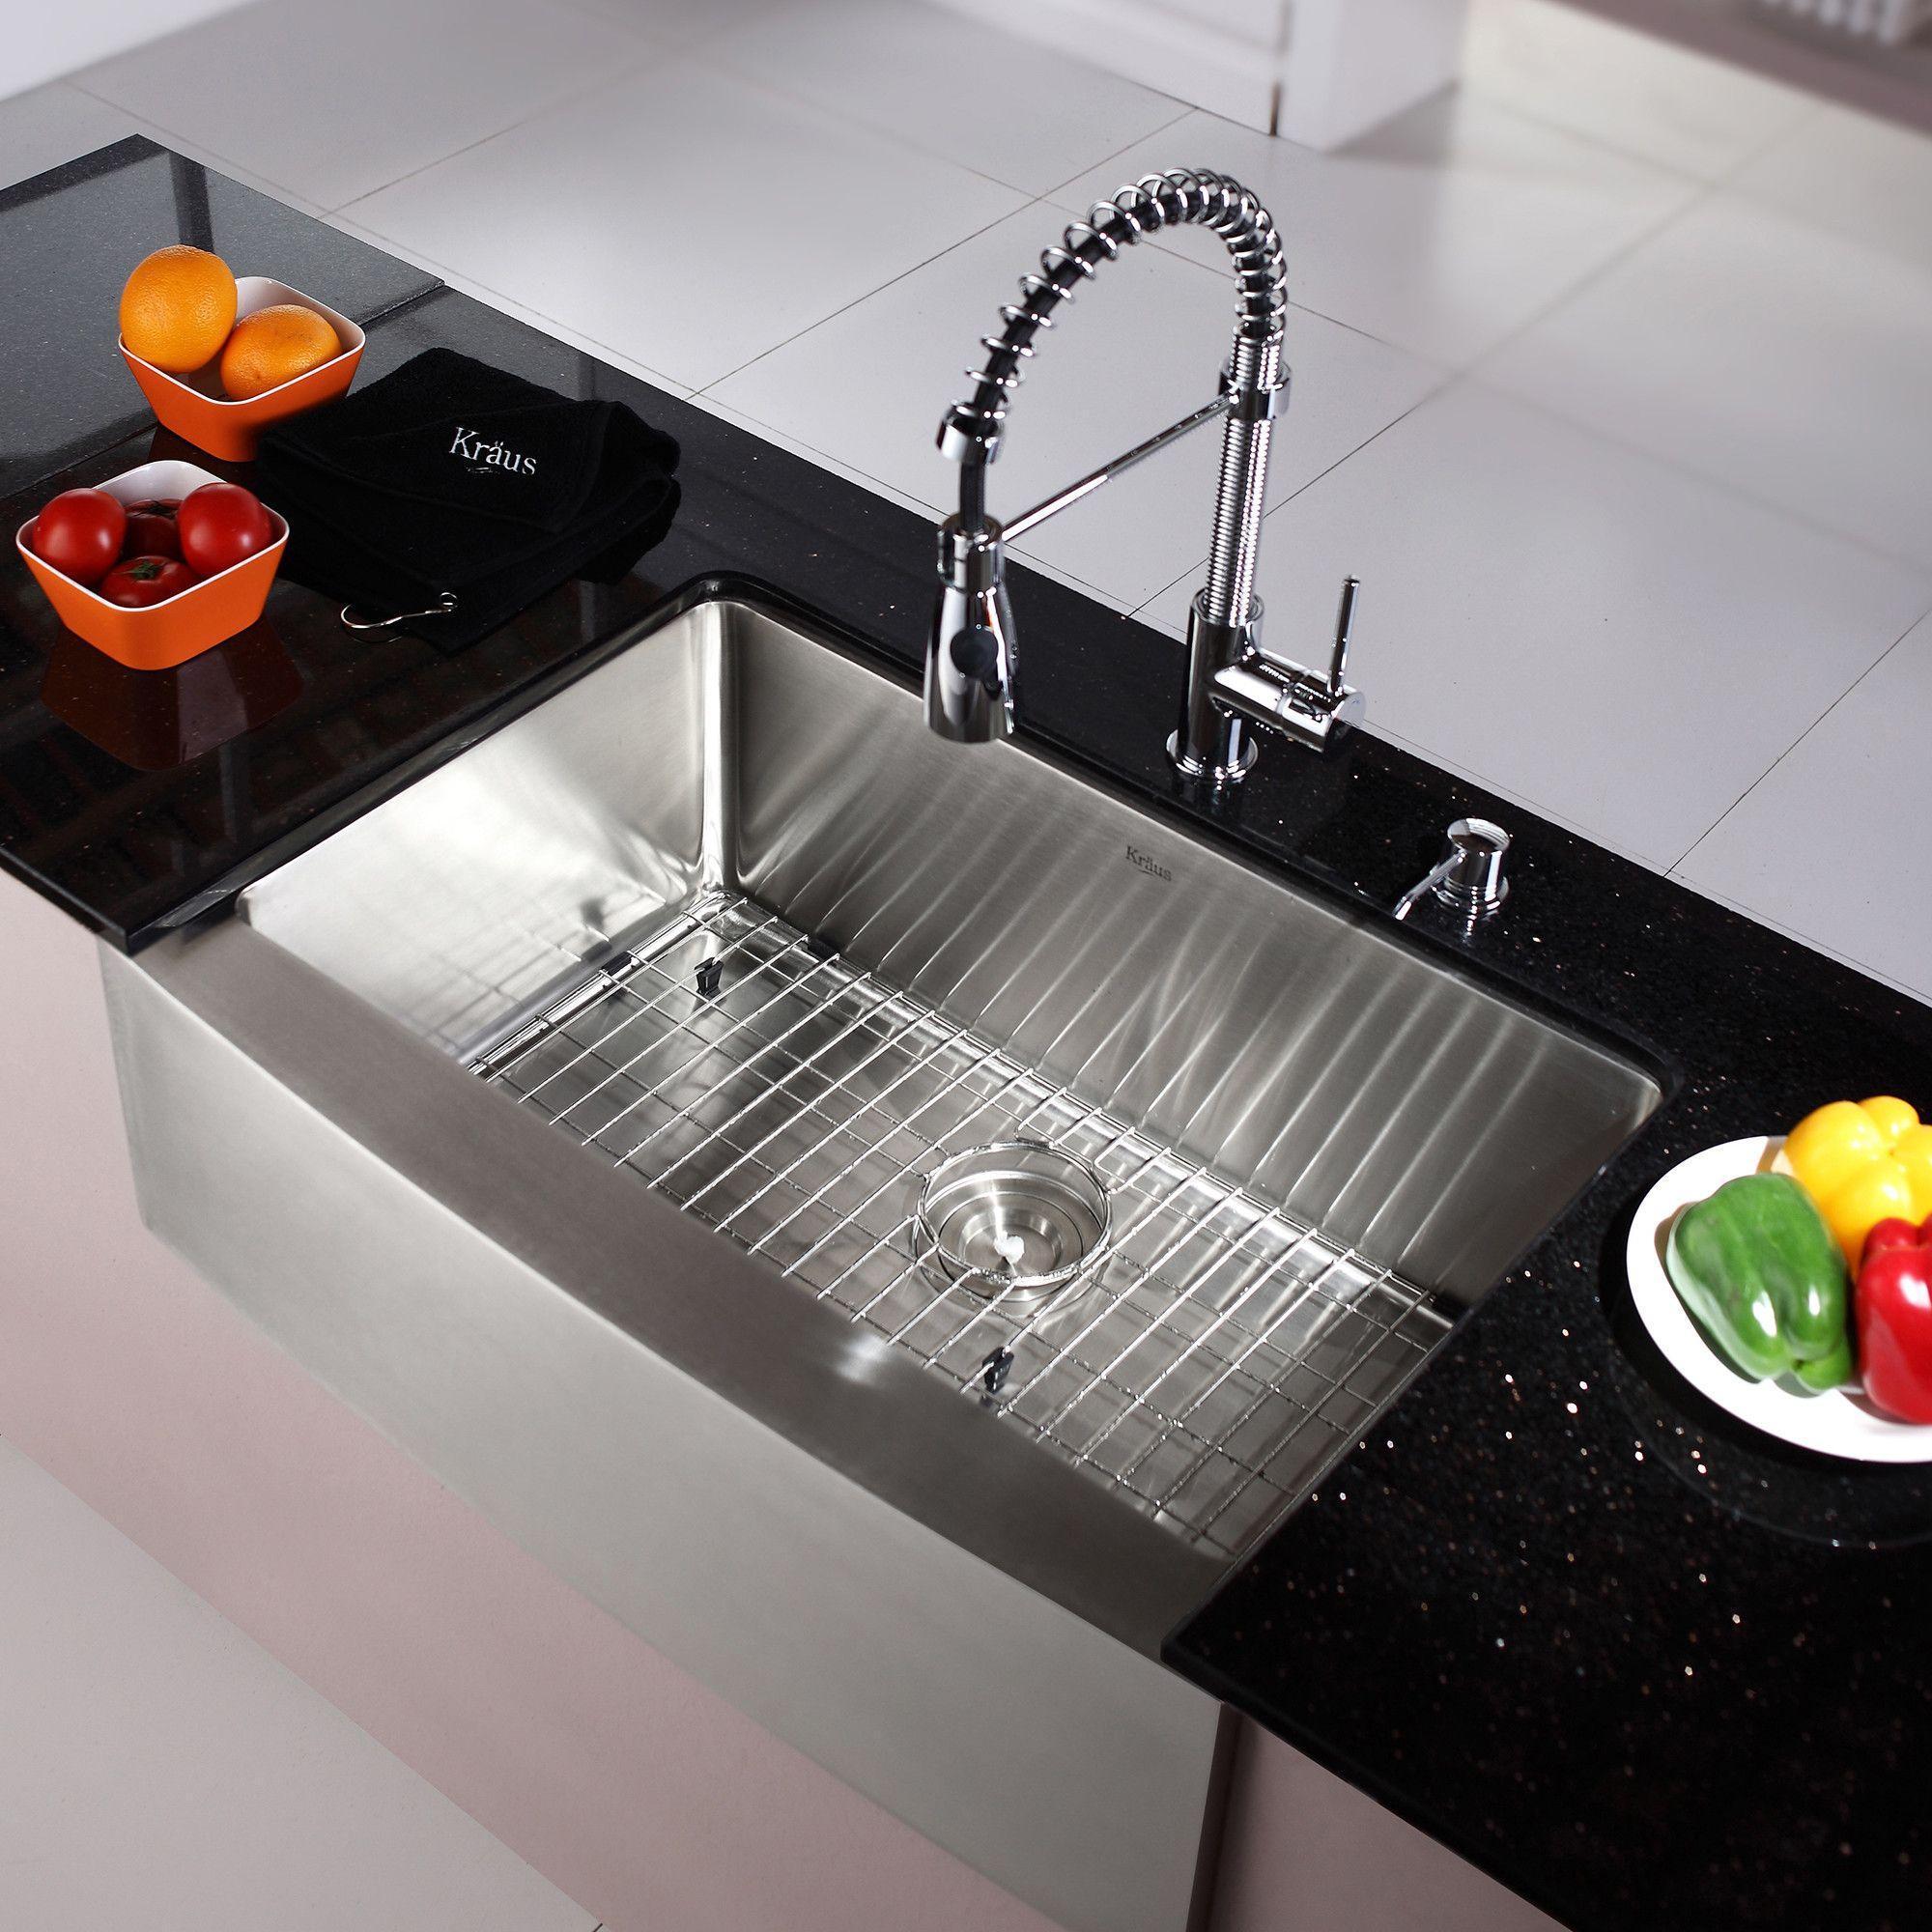 Kraus Kraus 30 Farmhouse Stainless Steel 29 75 X 20 Kitchen Sink With Faucet And Farmhouse Apron Kitchen Sinks Galley Kitchen Remodel Kitchen Remodel Layout